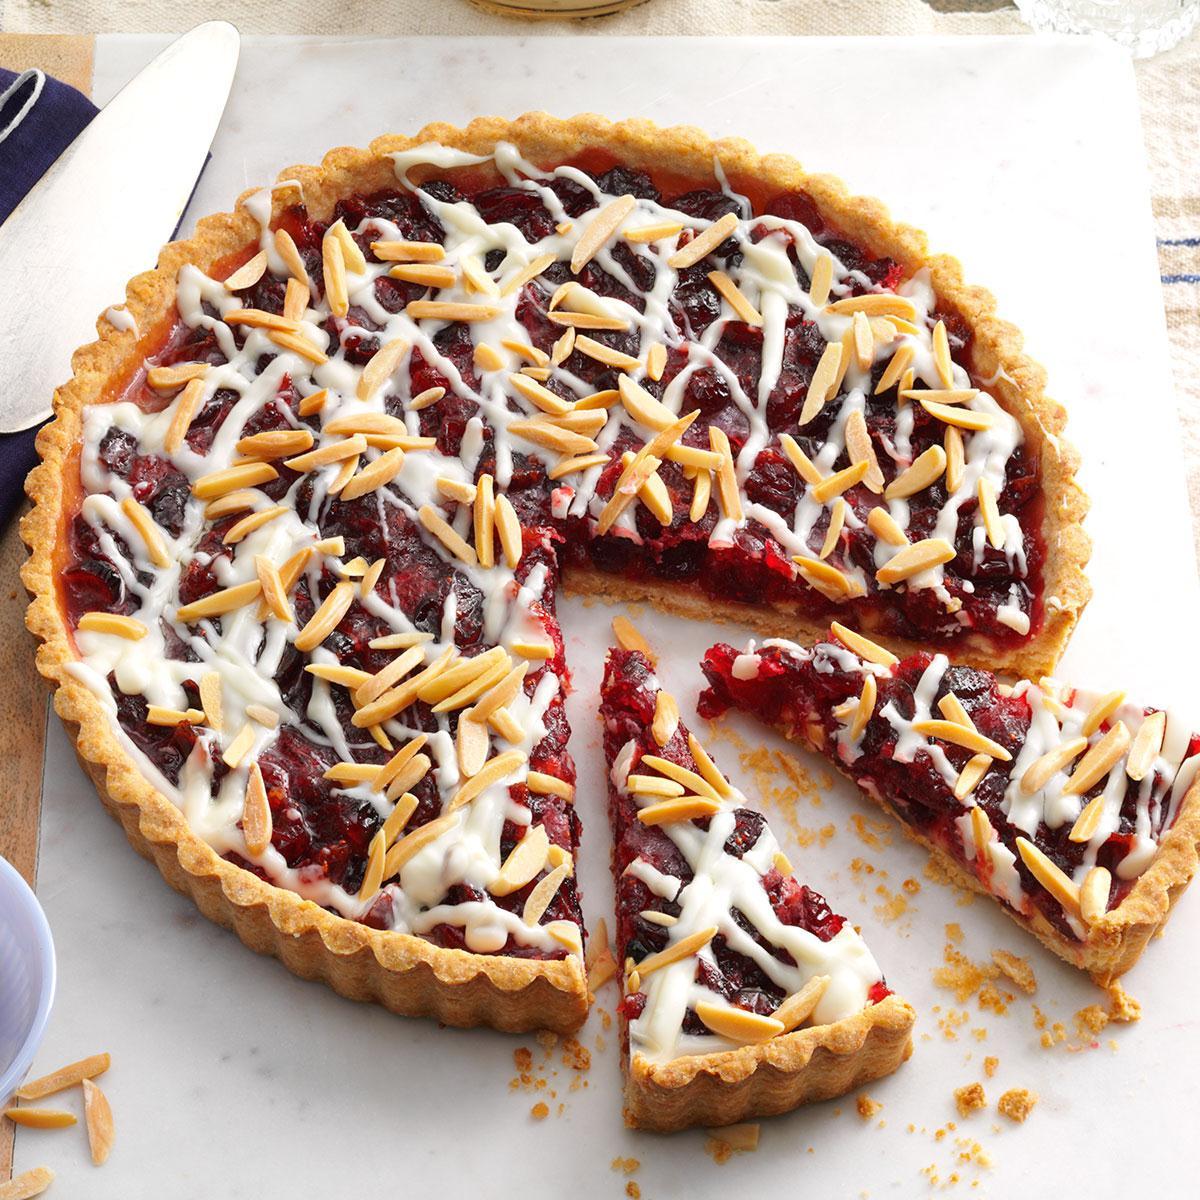 White Chocolate Cranberry Almond Tart